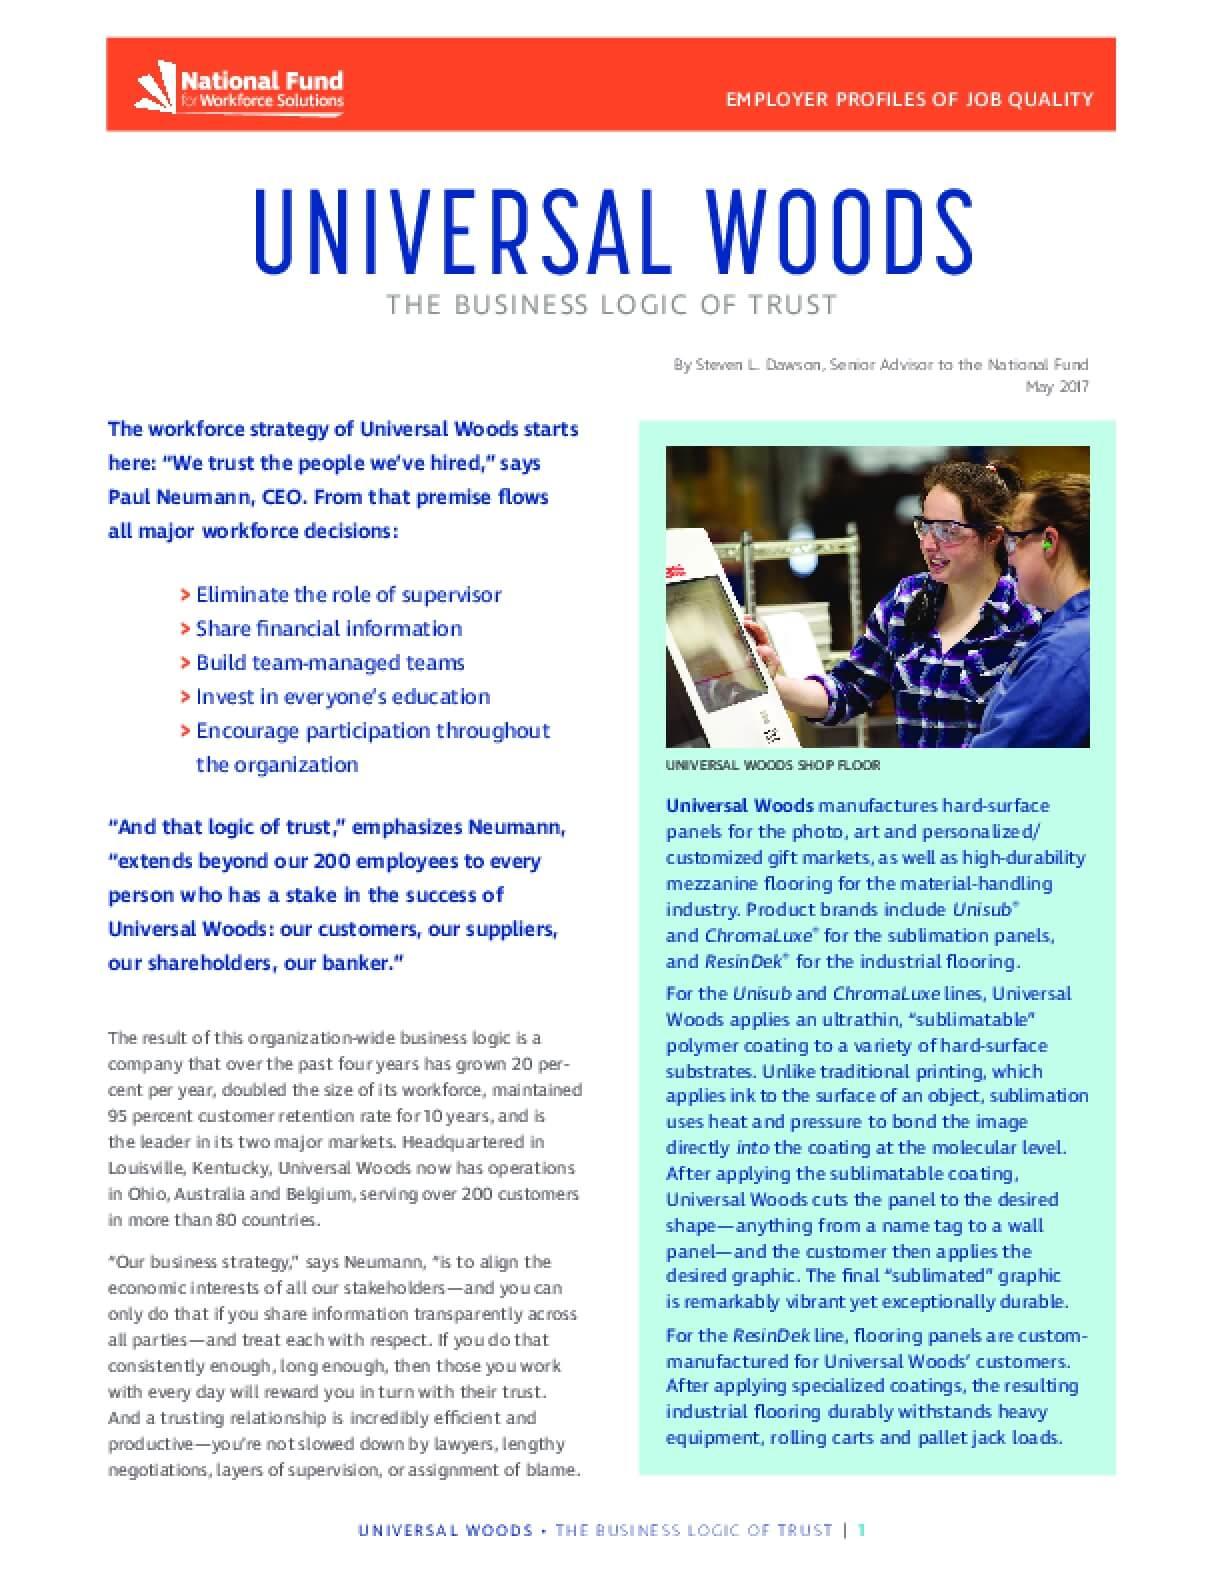 Universal Woods: Business Logic of Trust